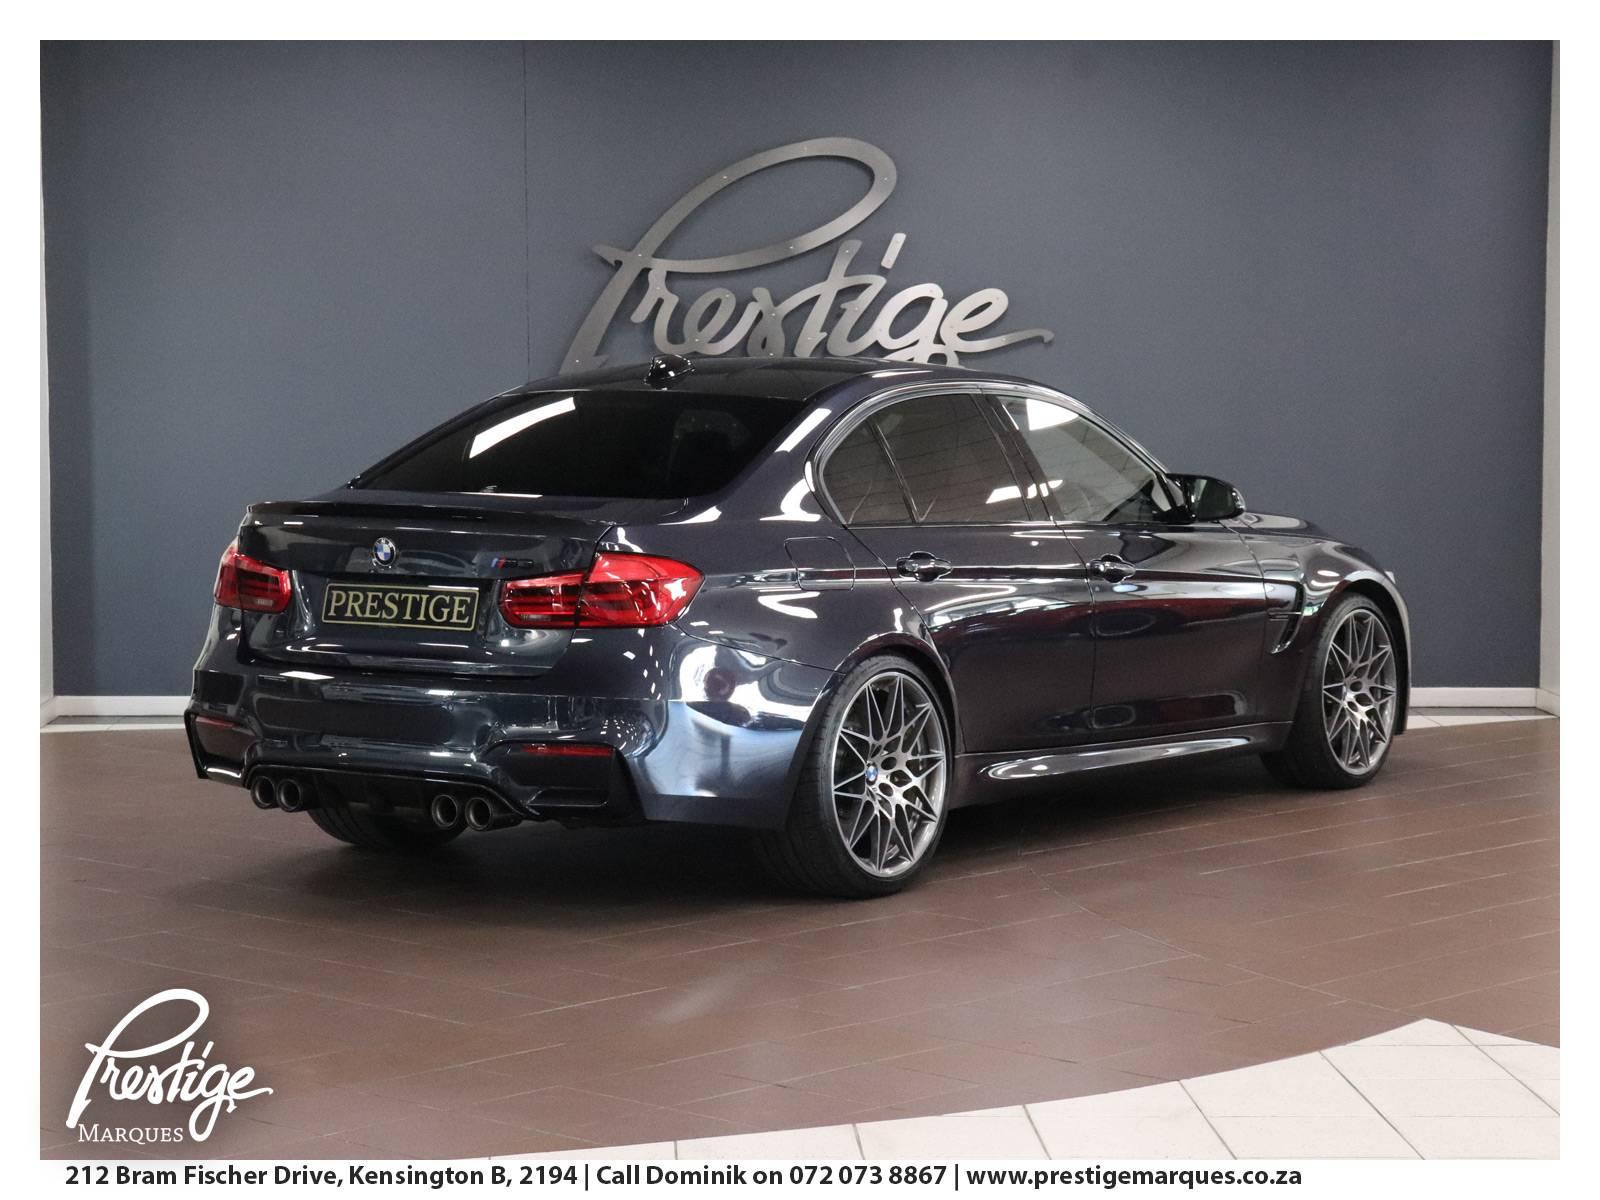 2016-BMW-M3-MDCT-30-Jarare-Prestige-Marques-Randburg-Sandton-3